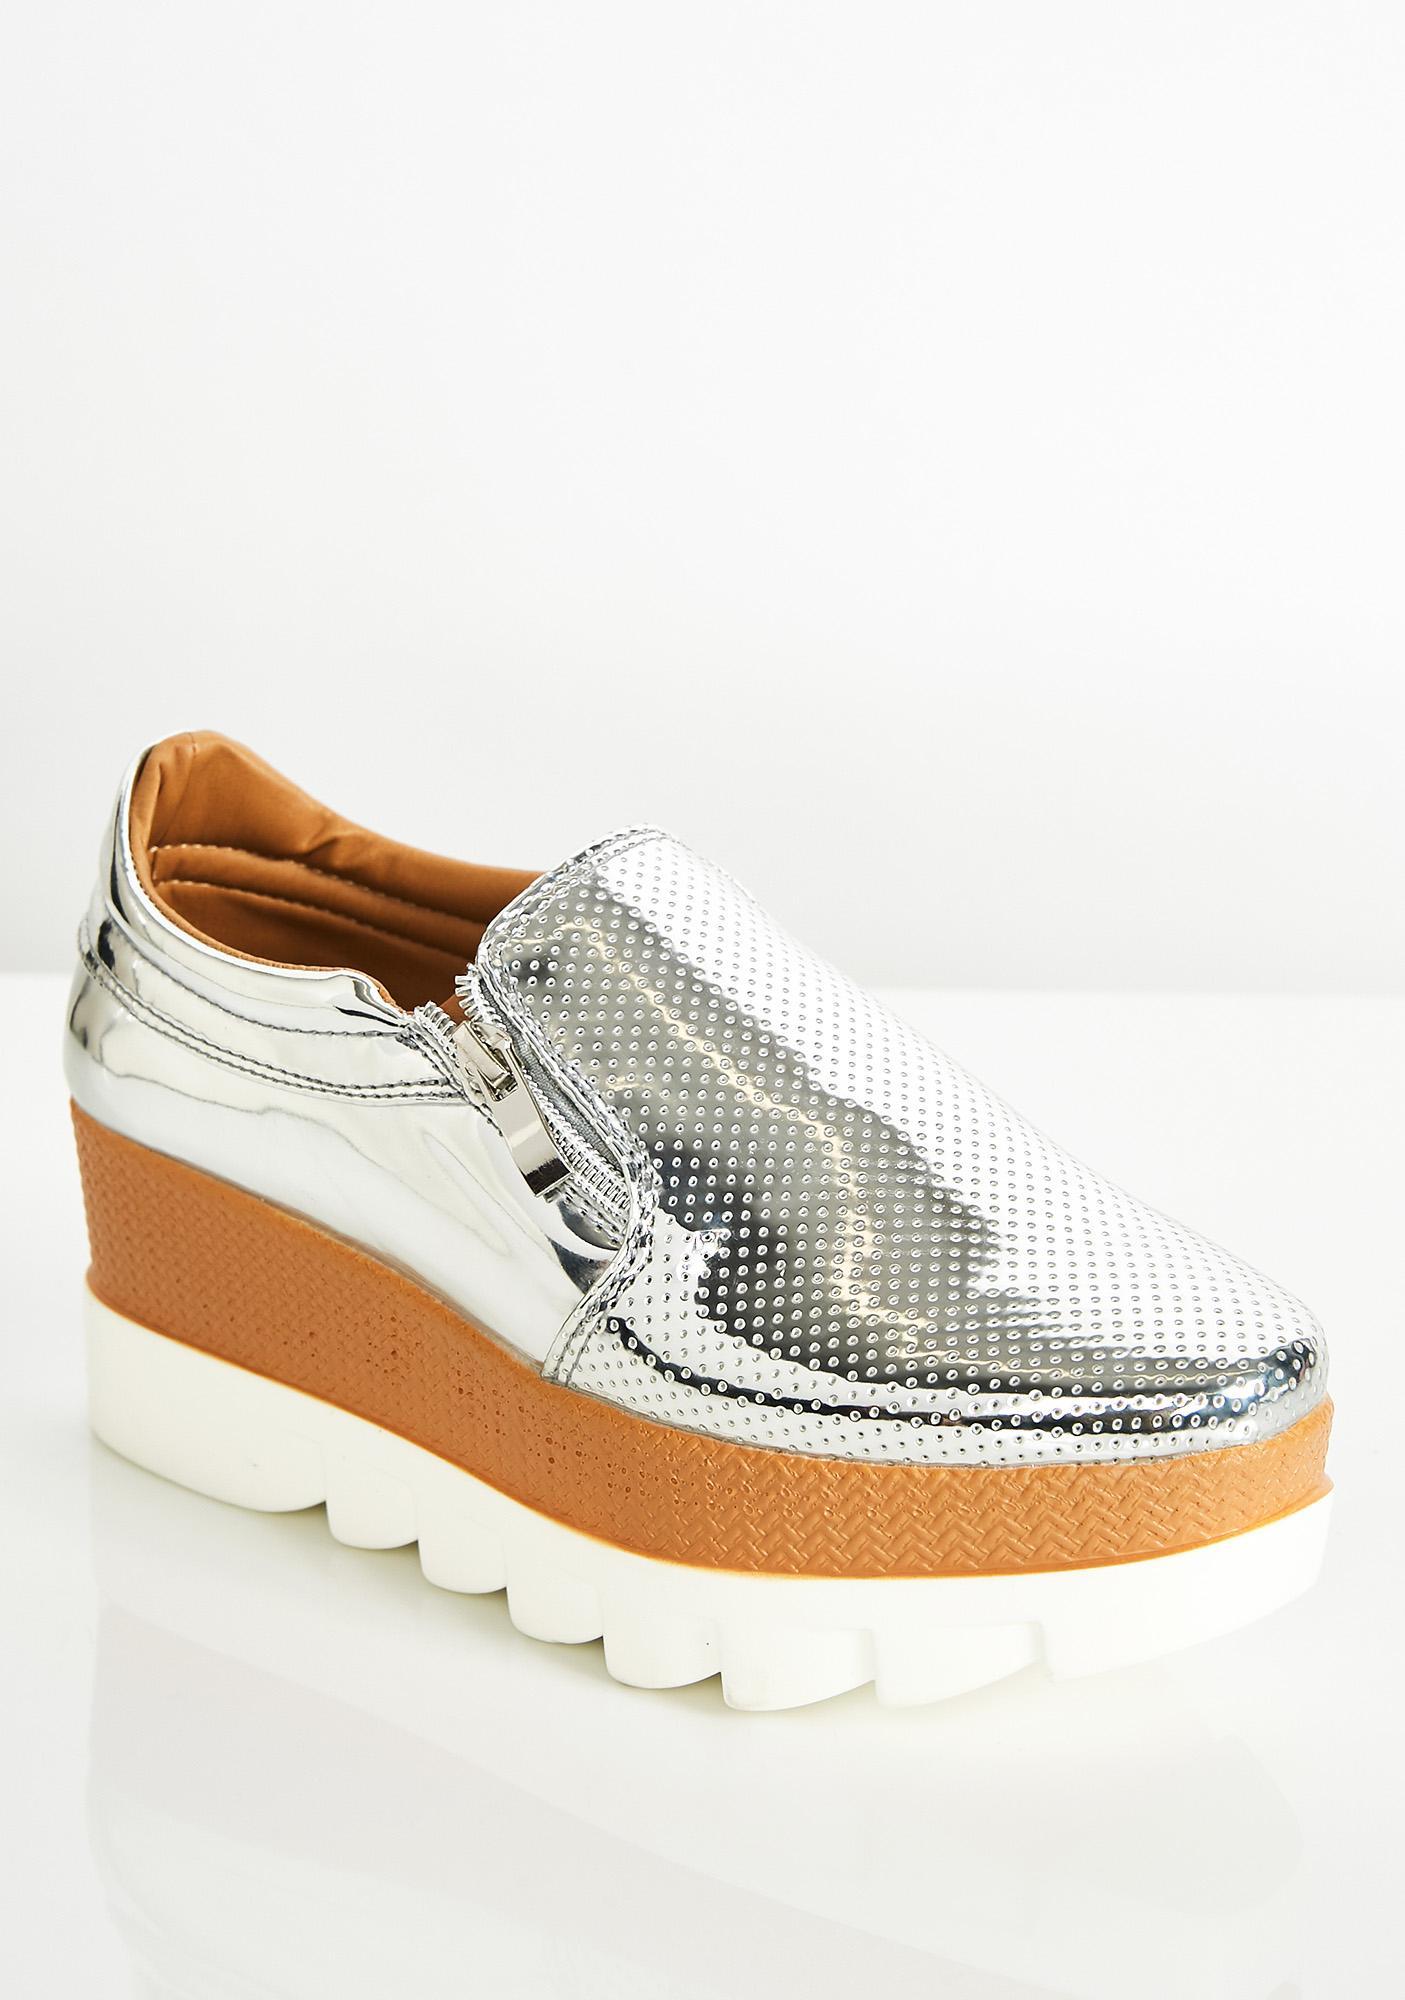 Sky High Metallic Loafer